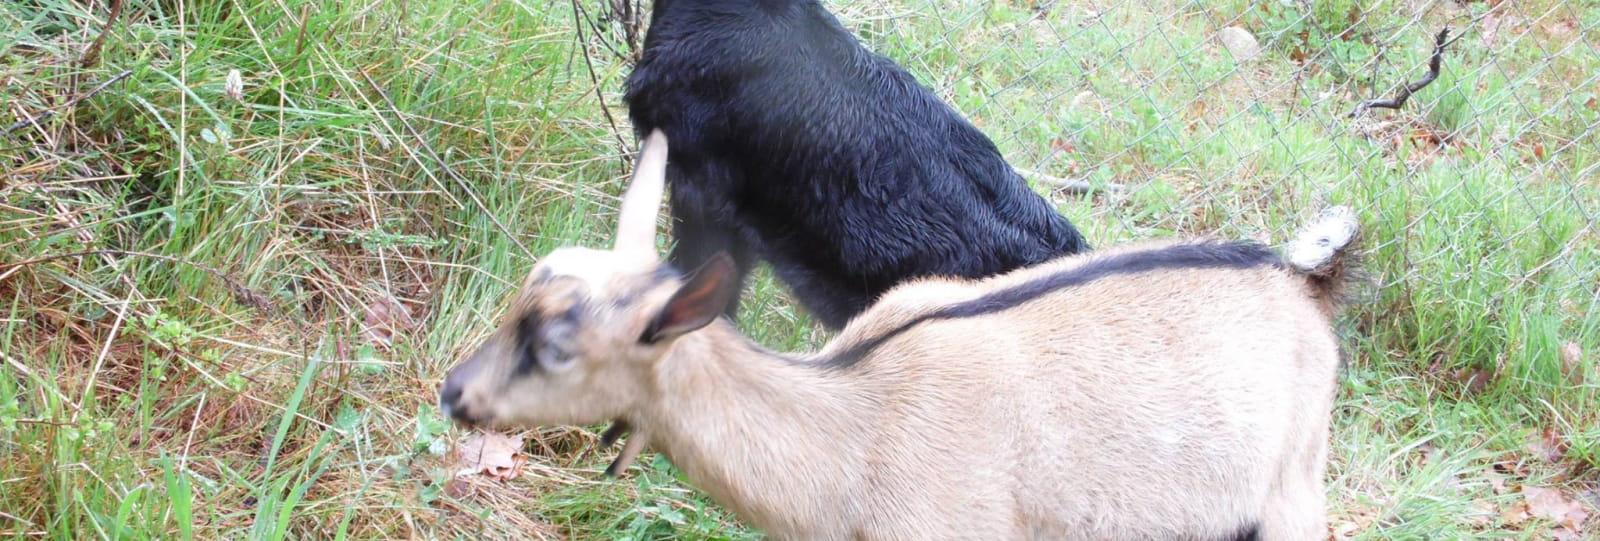 Chèvres _ Arlebosc